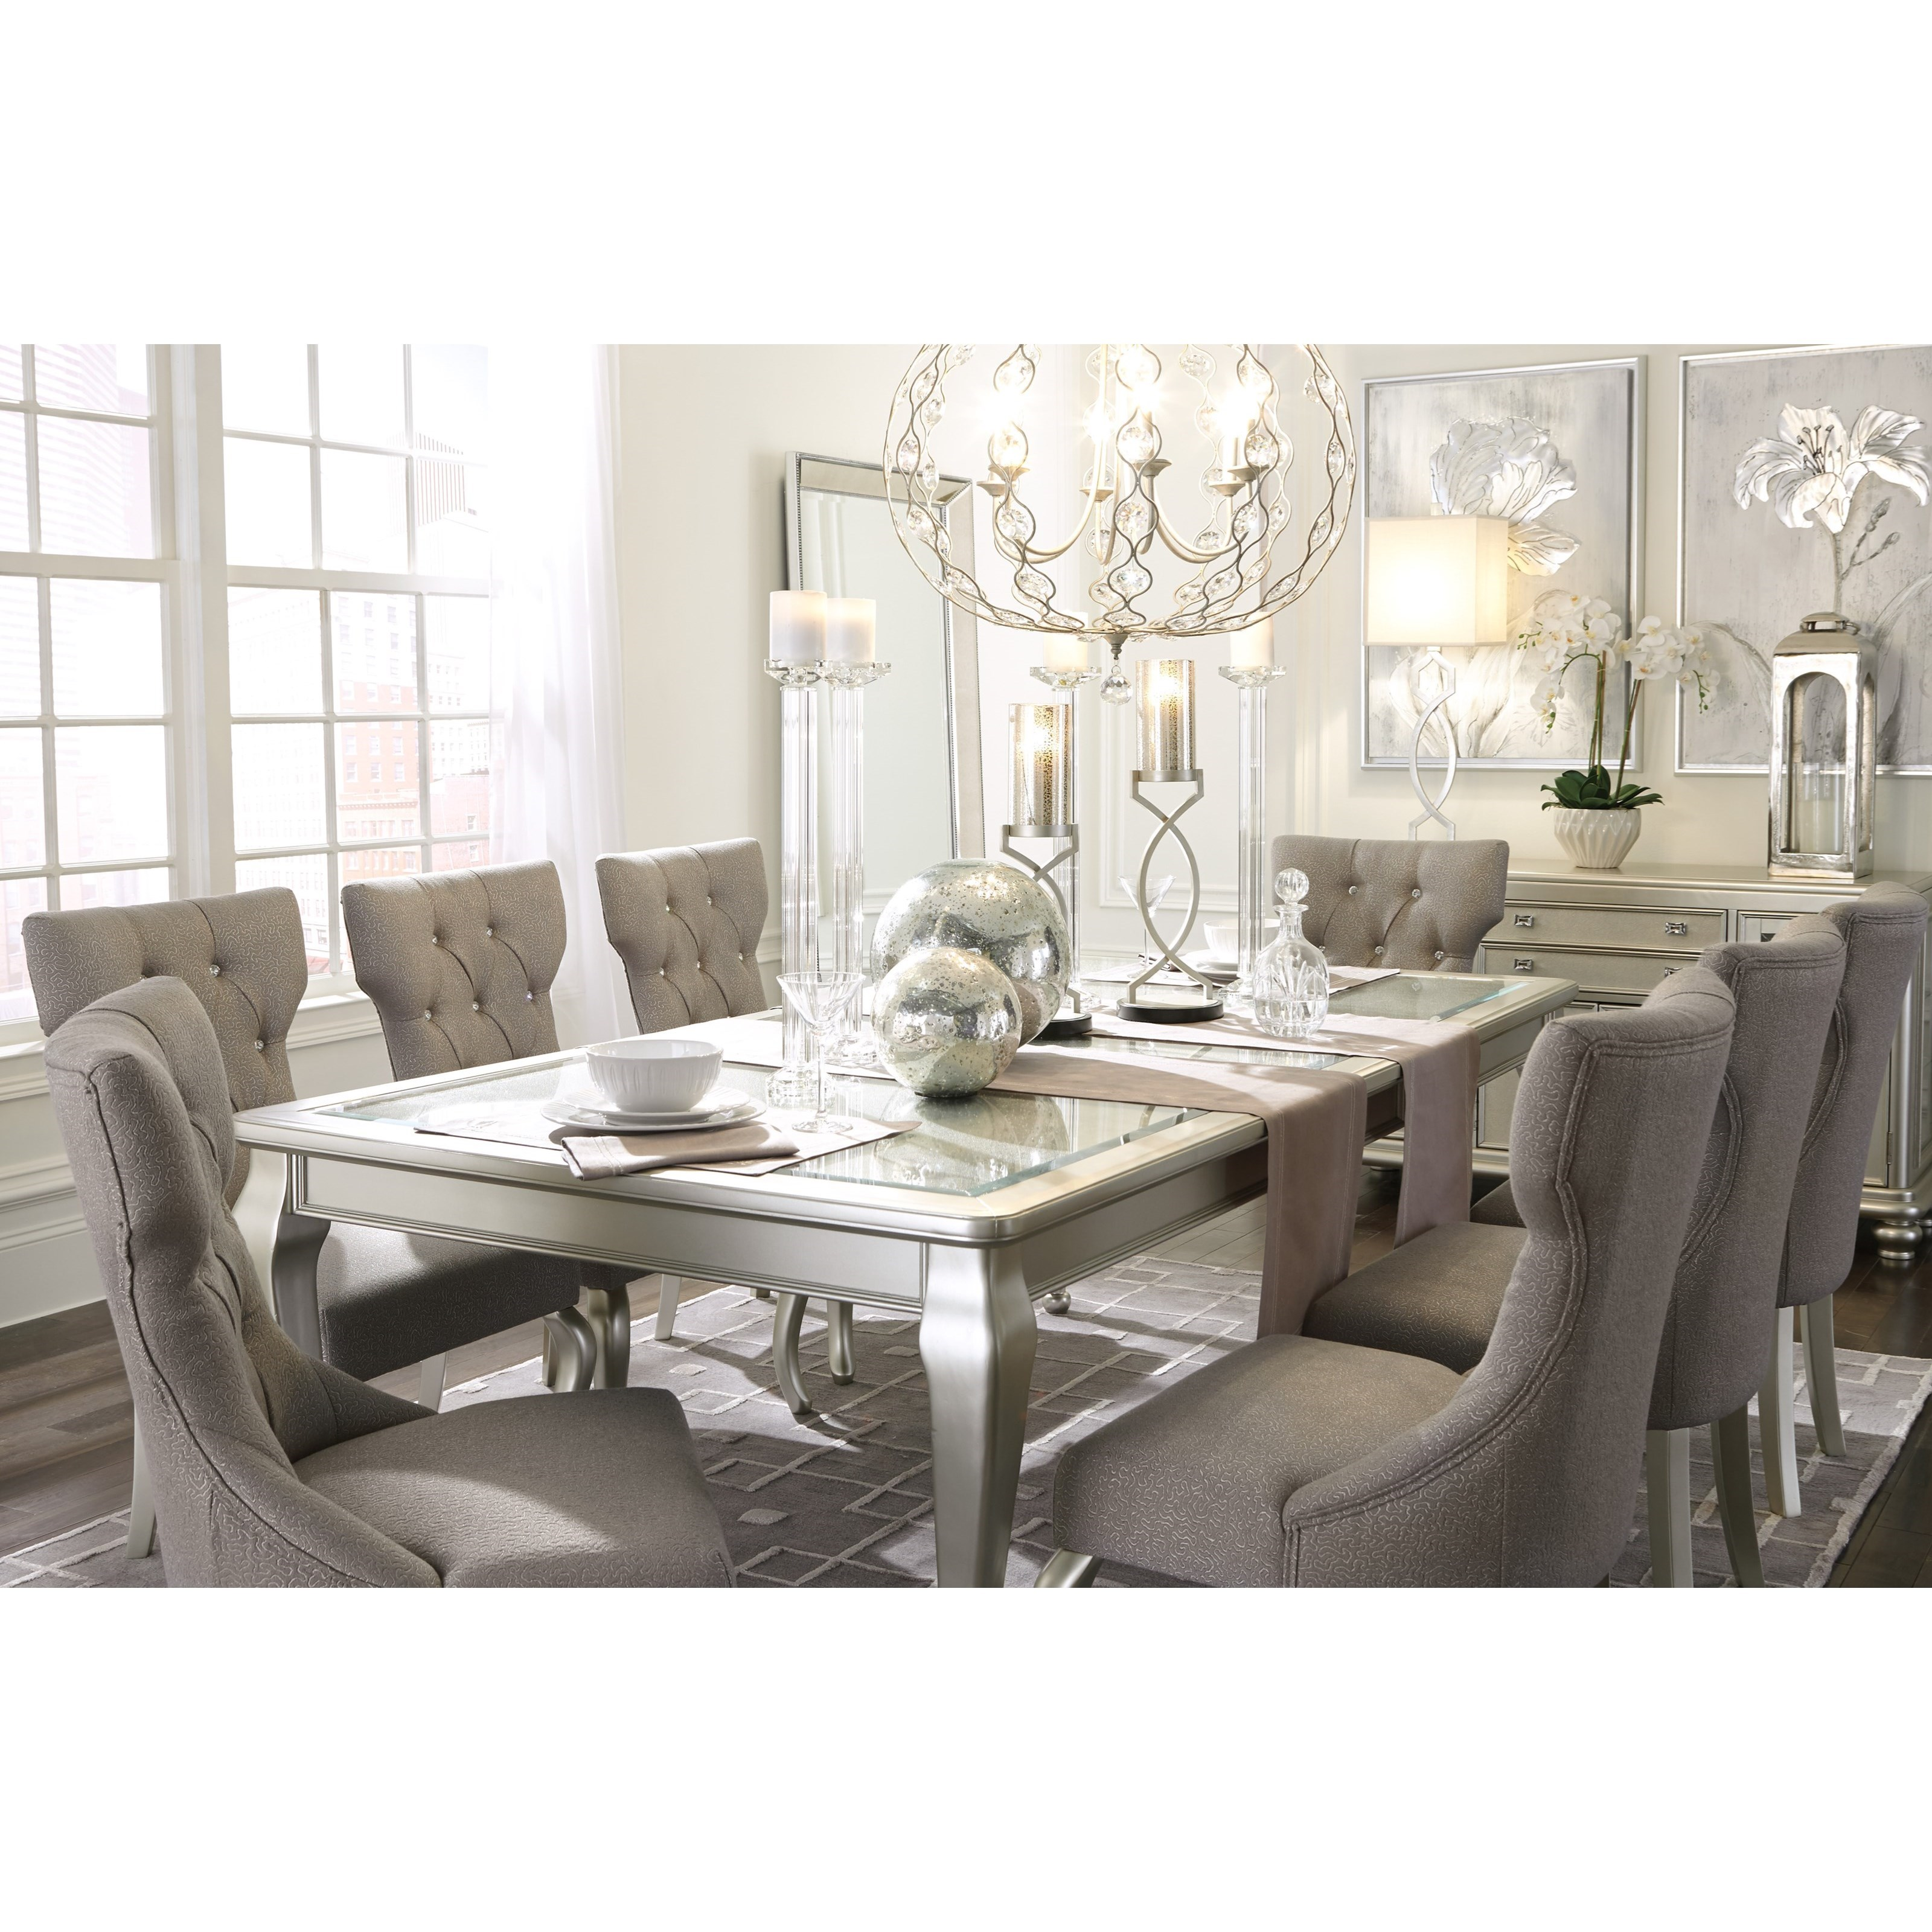 Ashley S Nest Decorating A Dining Room: Signature Design By Ashley Coralayne 7-Piece Rectangular